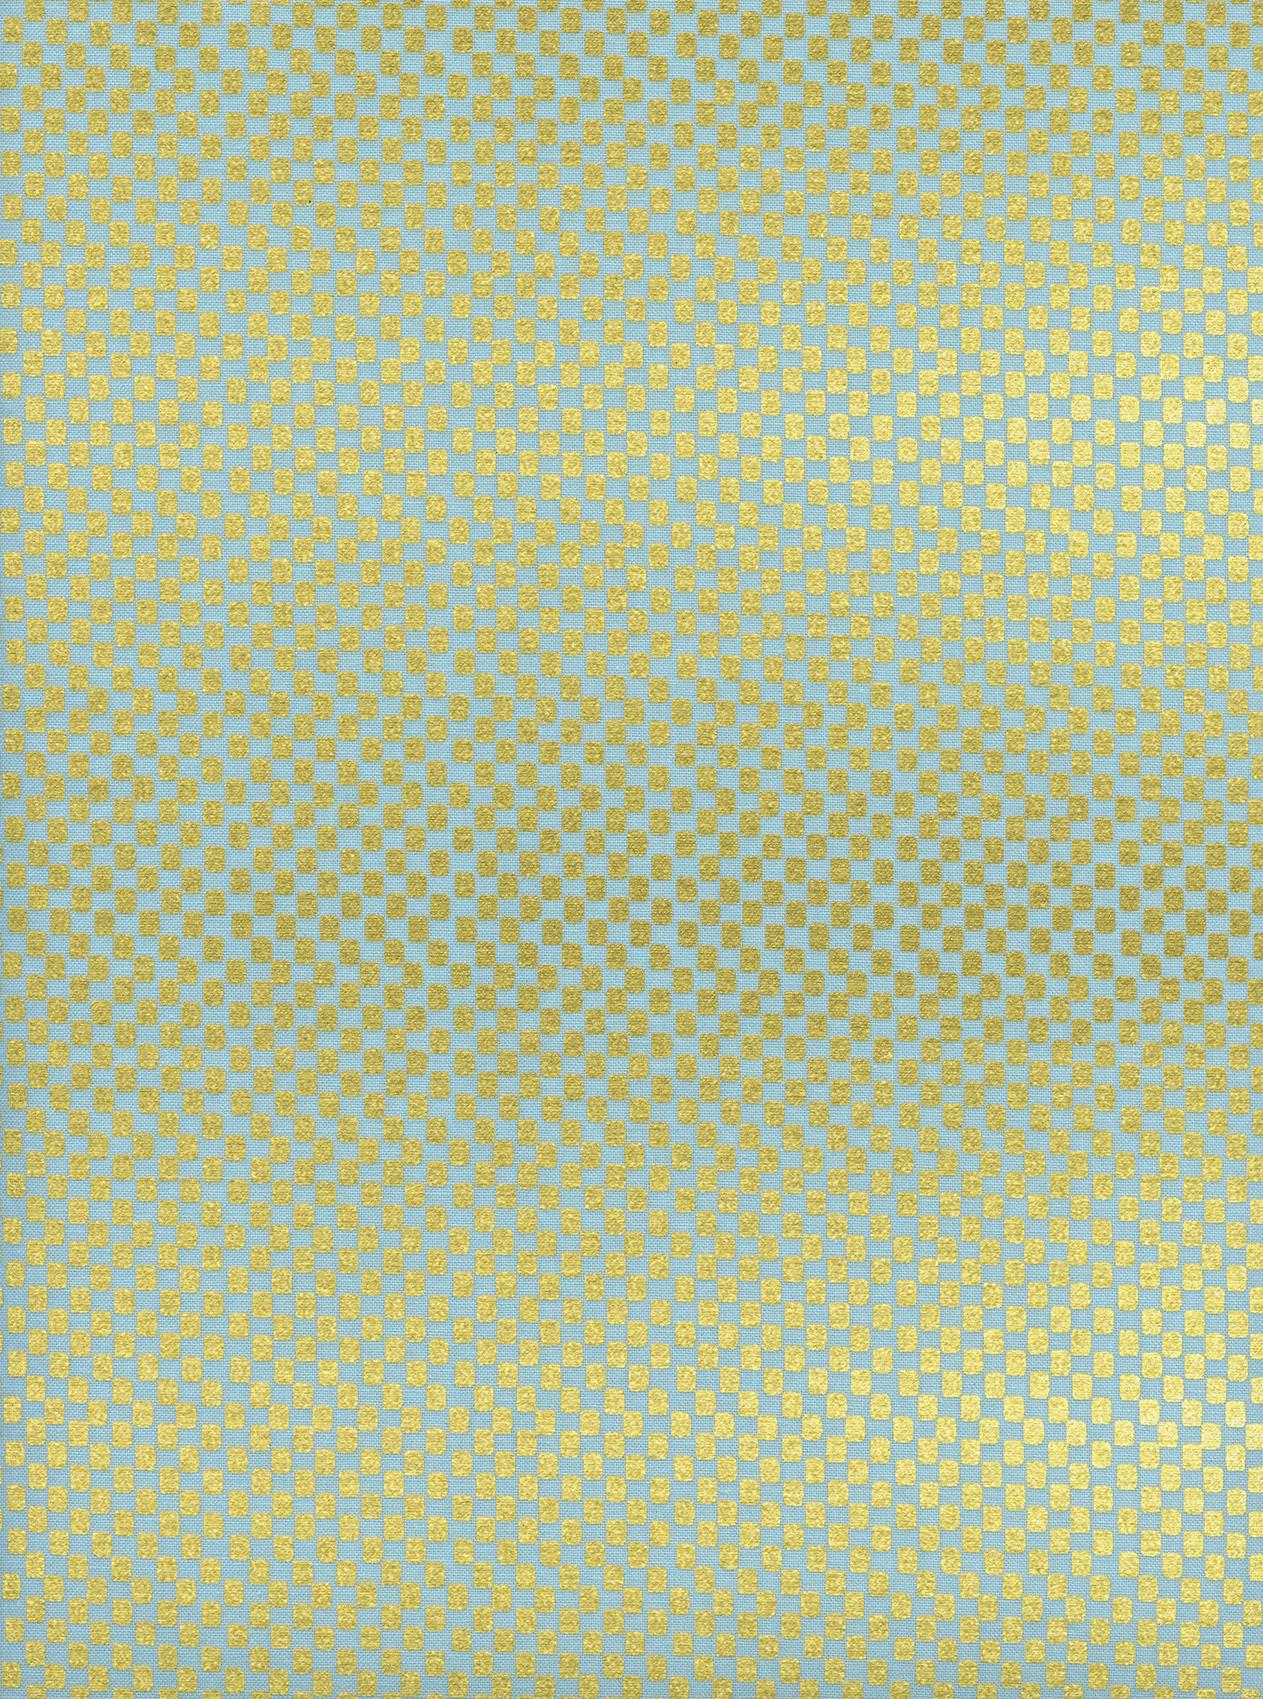 Rifle Paper Co. Amalfi - Checkers (Mint Metallic)